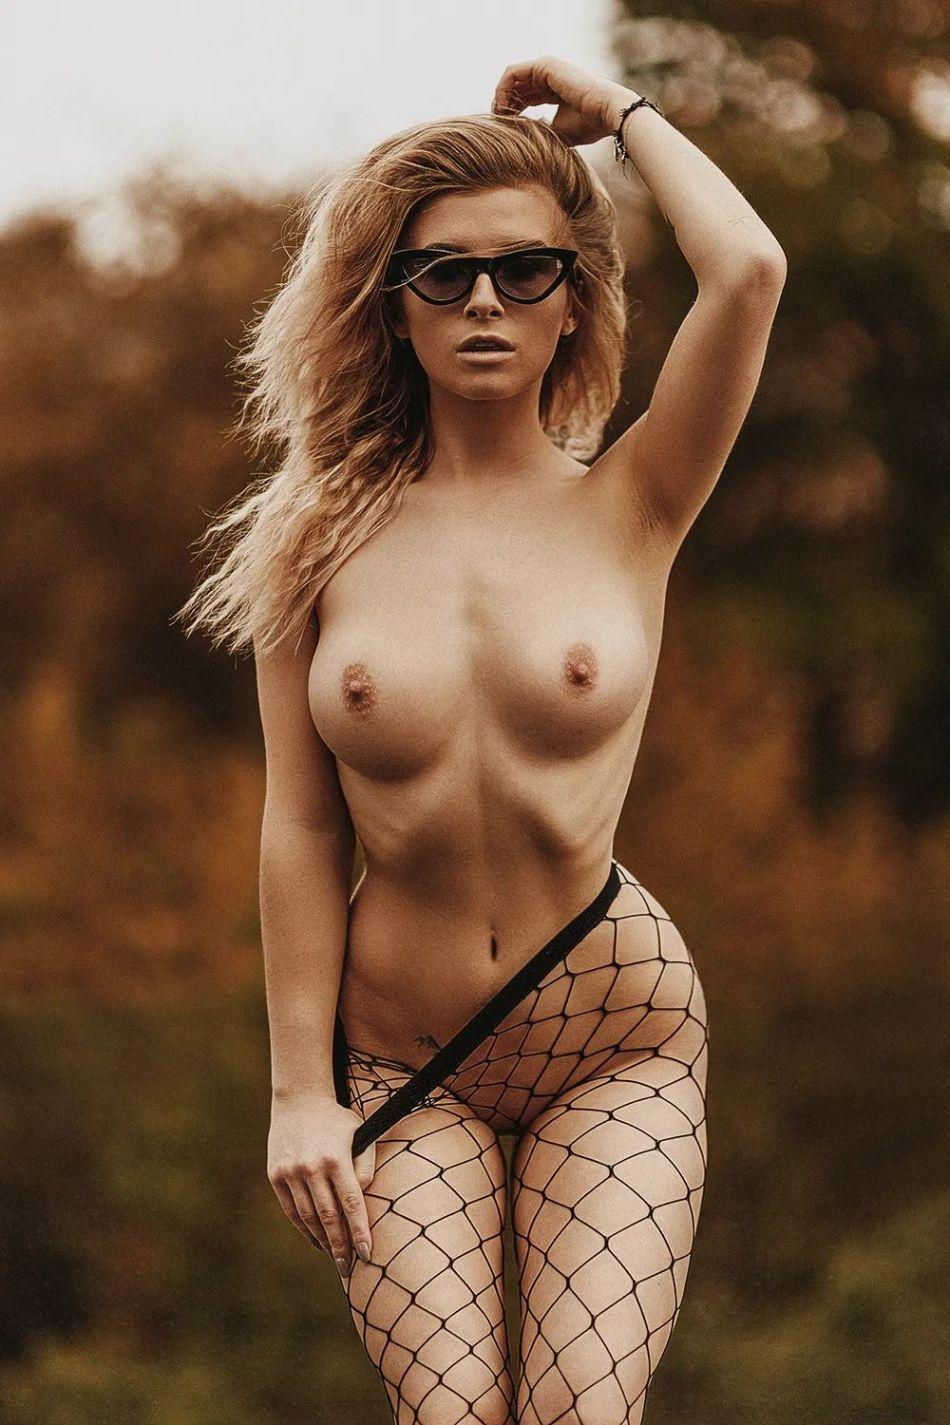 b_950_0_16777215_00_https___photar.ru_wp-content_uploads_2020_08_Karola-Chuchla_Photar_33.jpg